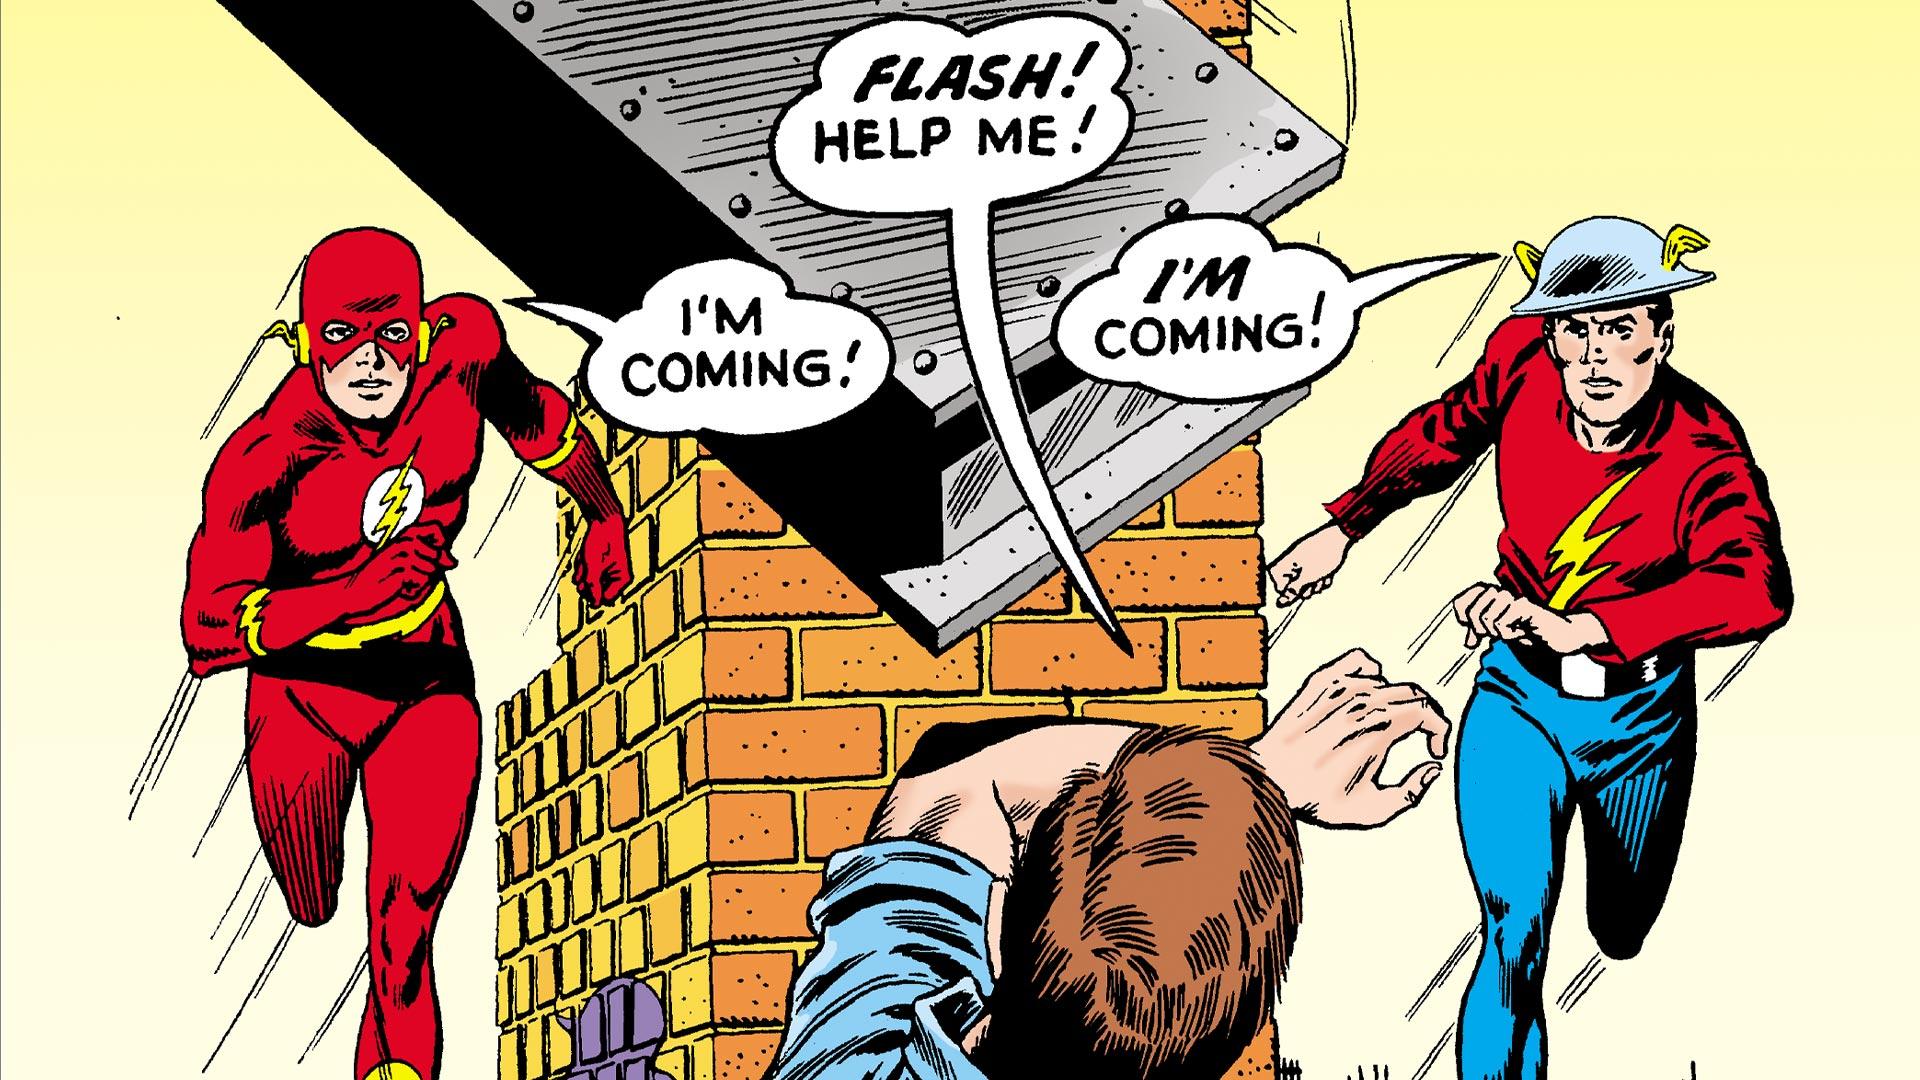 flash_news_v1_200117.jpg